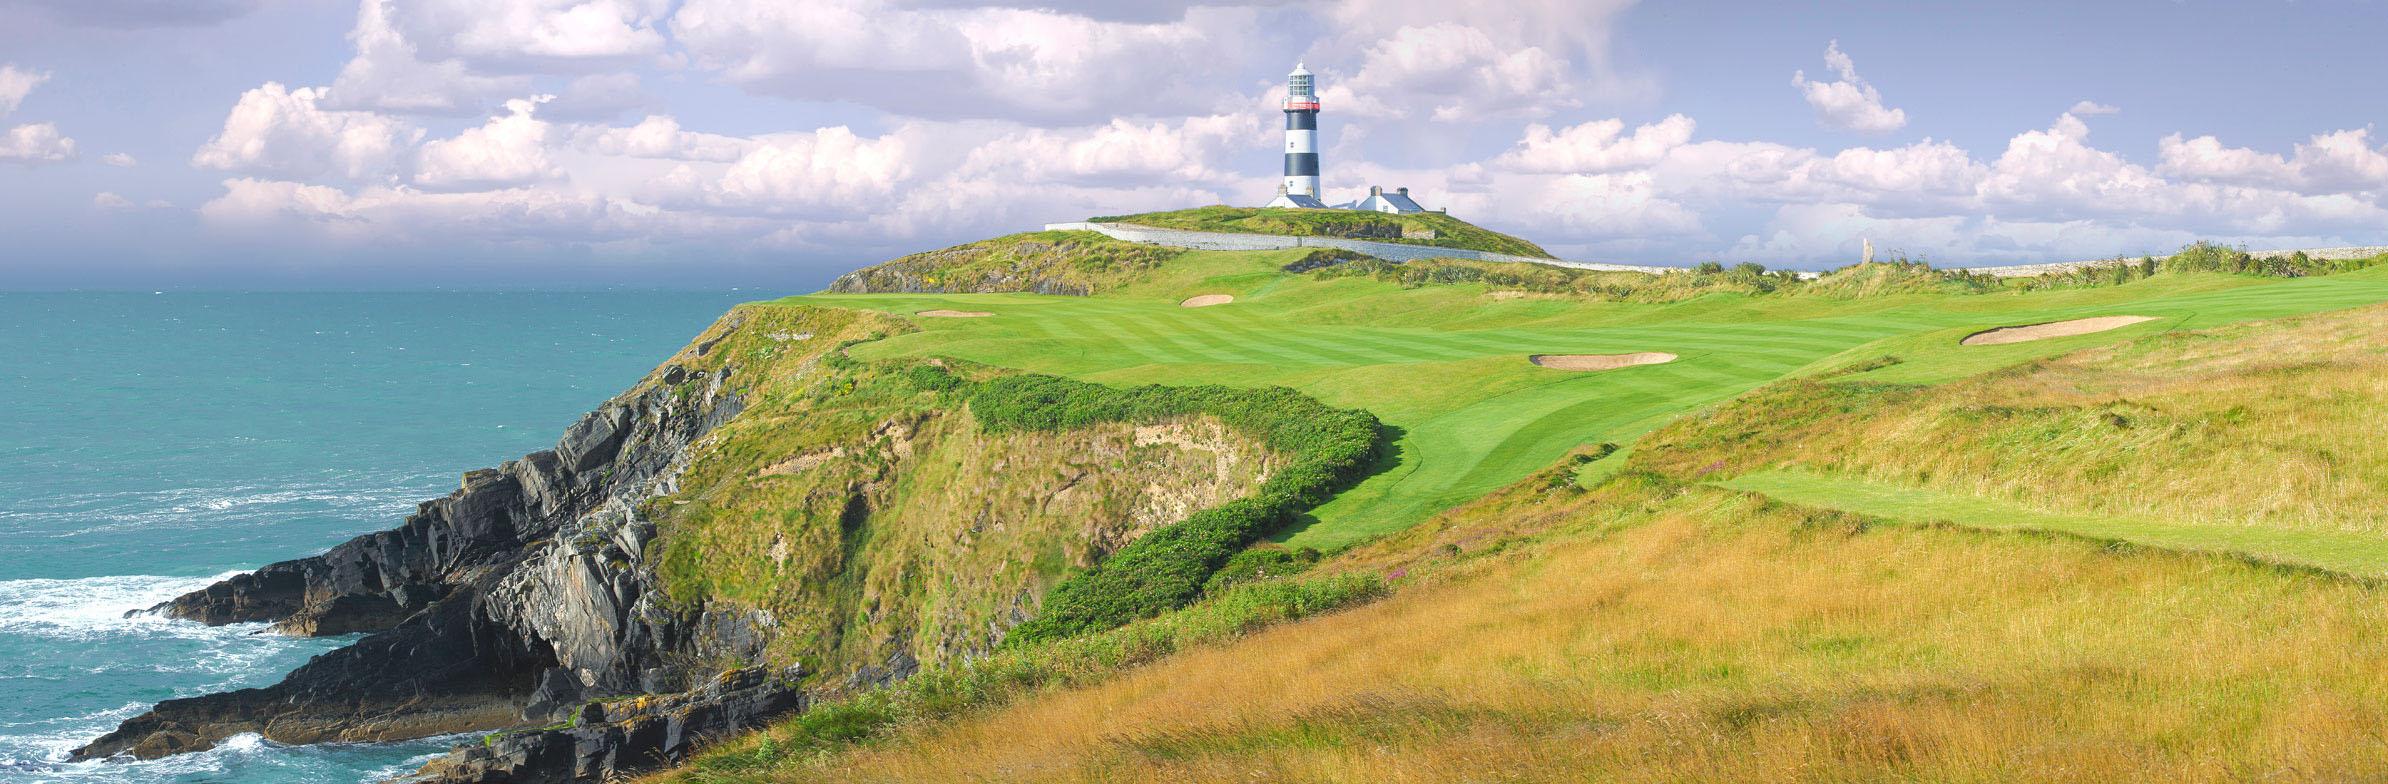 Golf Course Image - Old Head No. 4